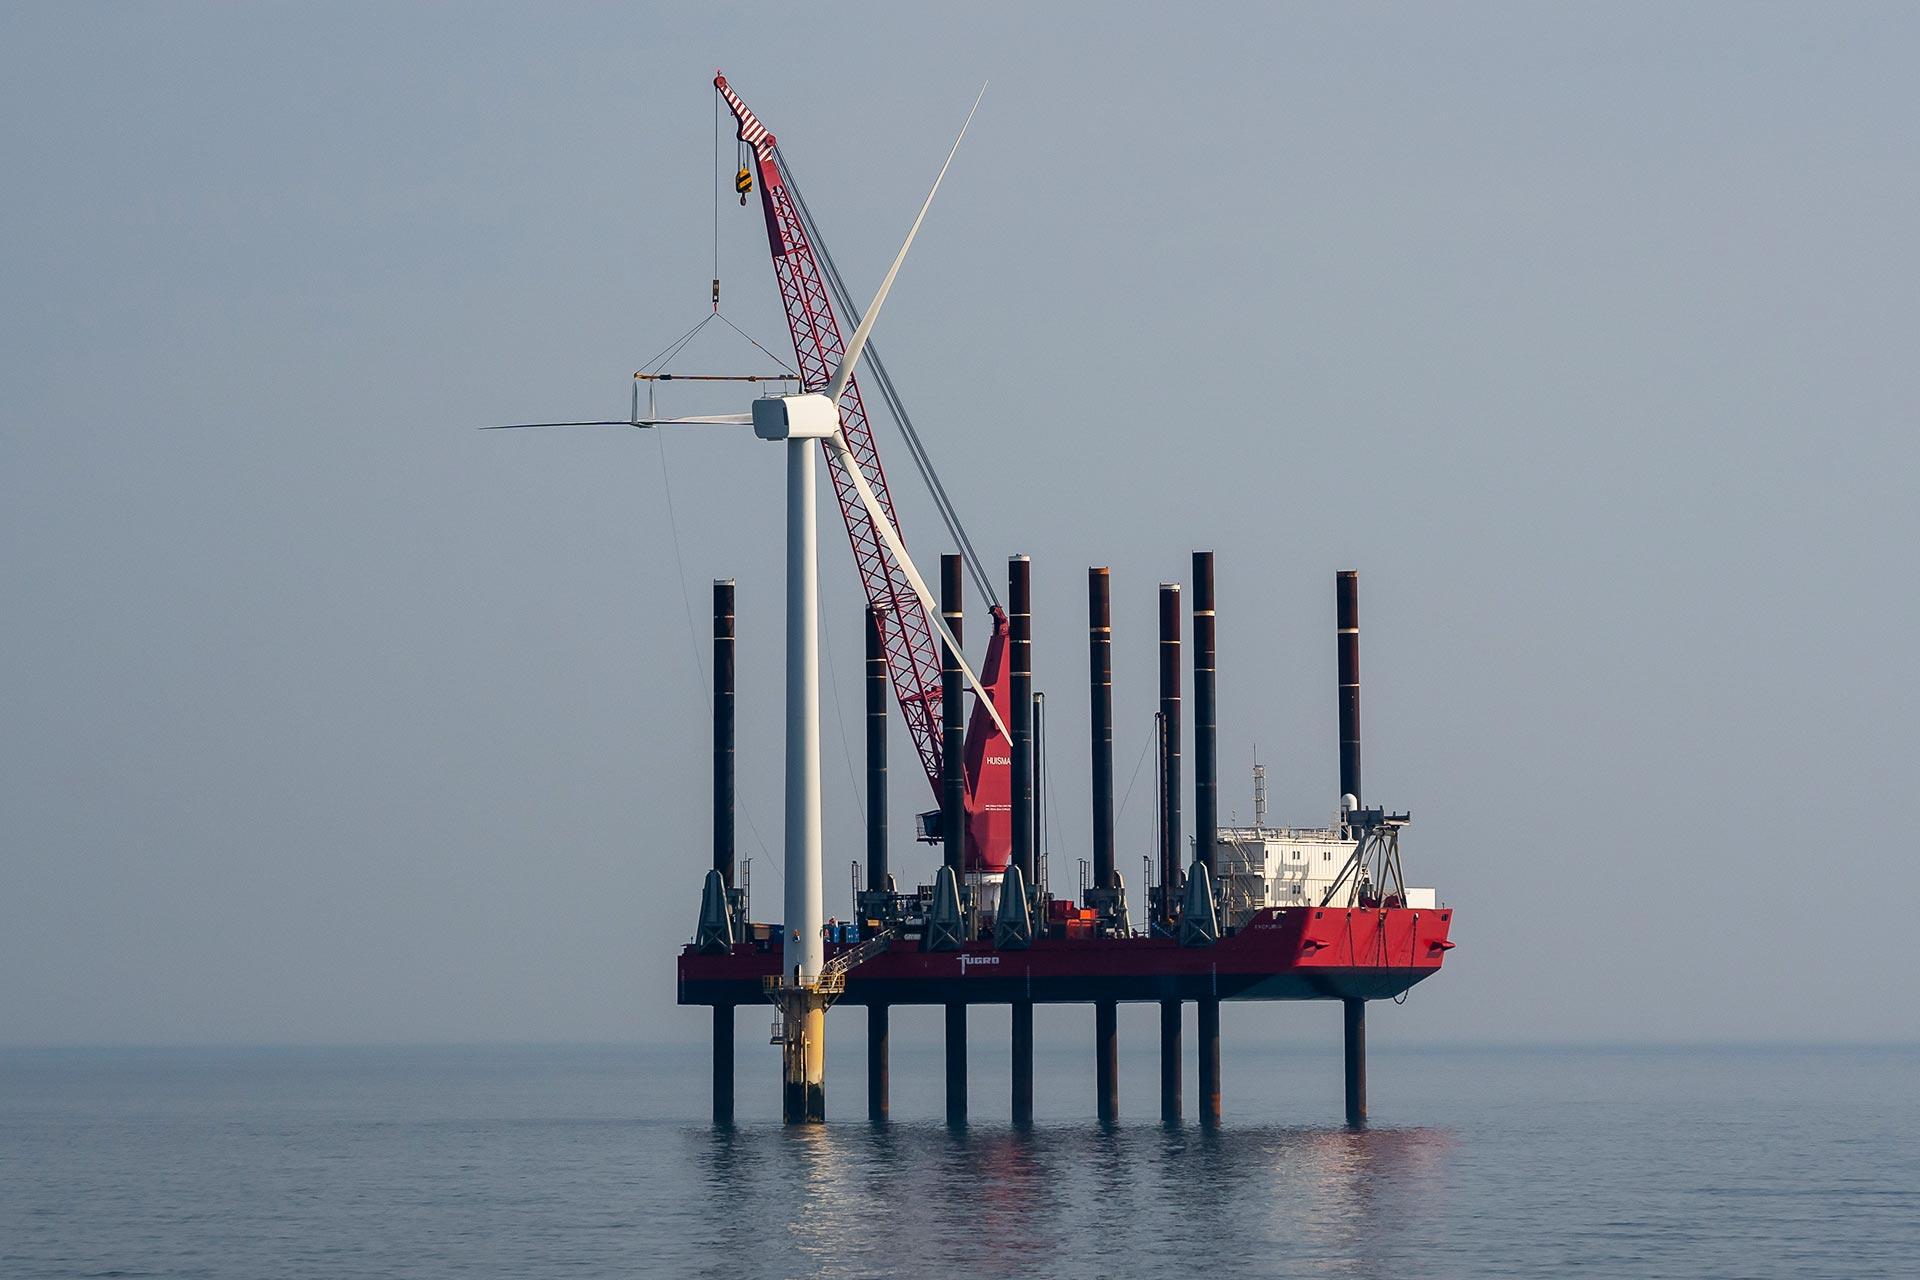 Blyth offshore wind farm banner